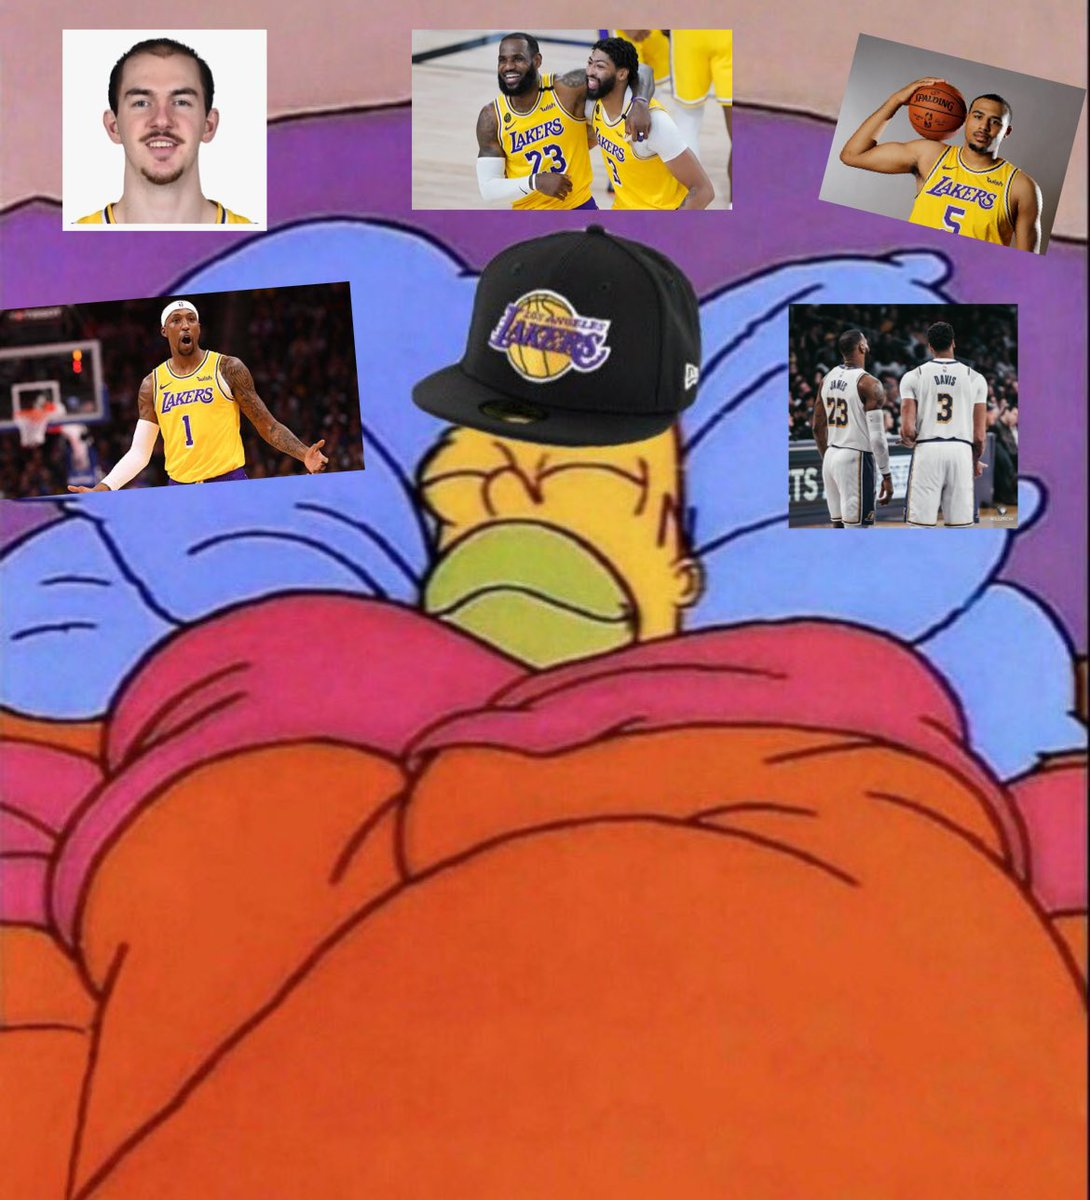 @Lakers @KingJames @AntDavis23 @MONSTATREZZ